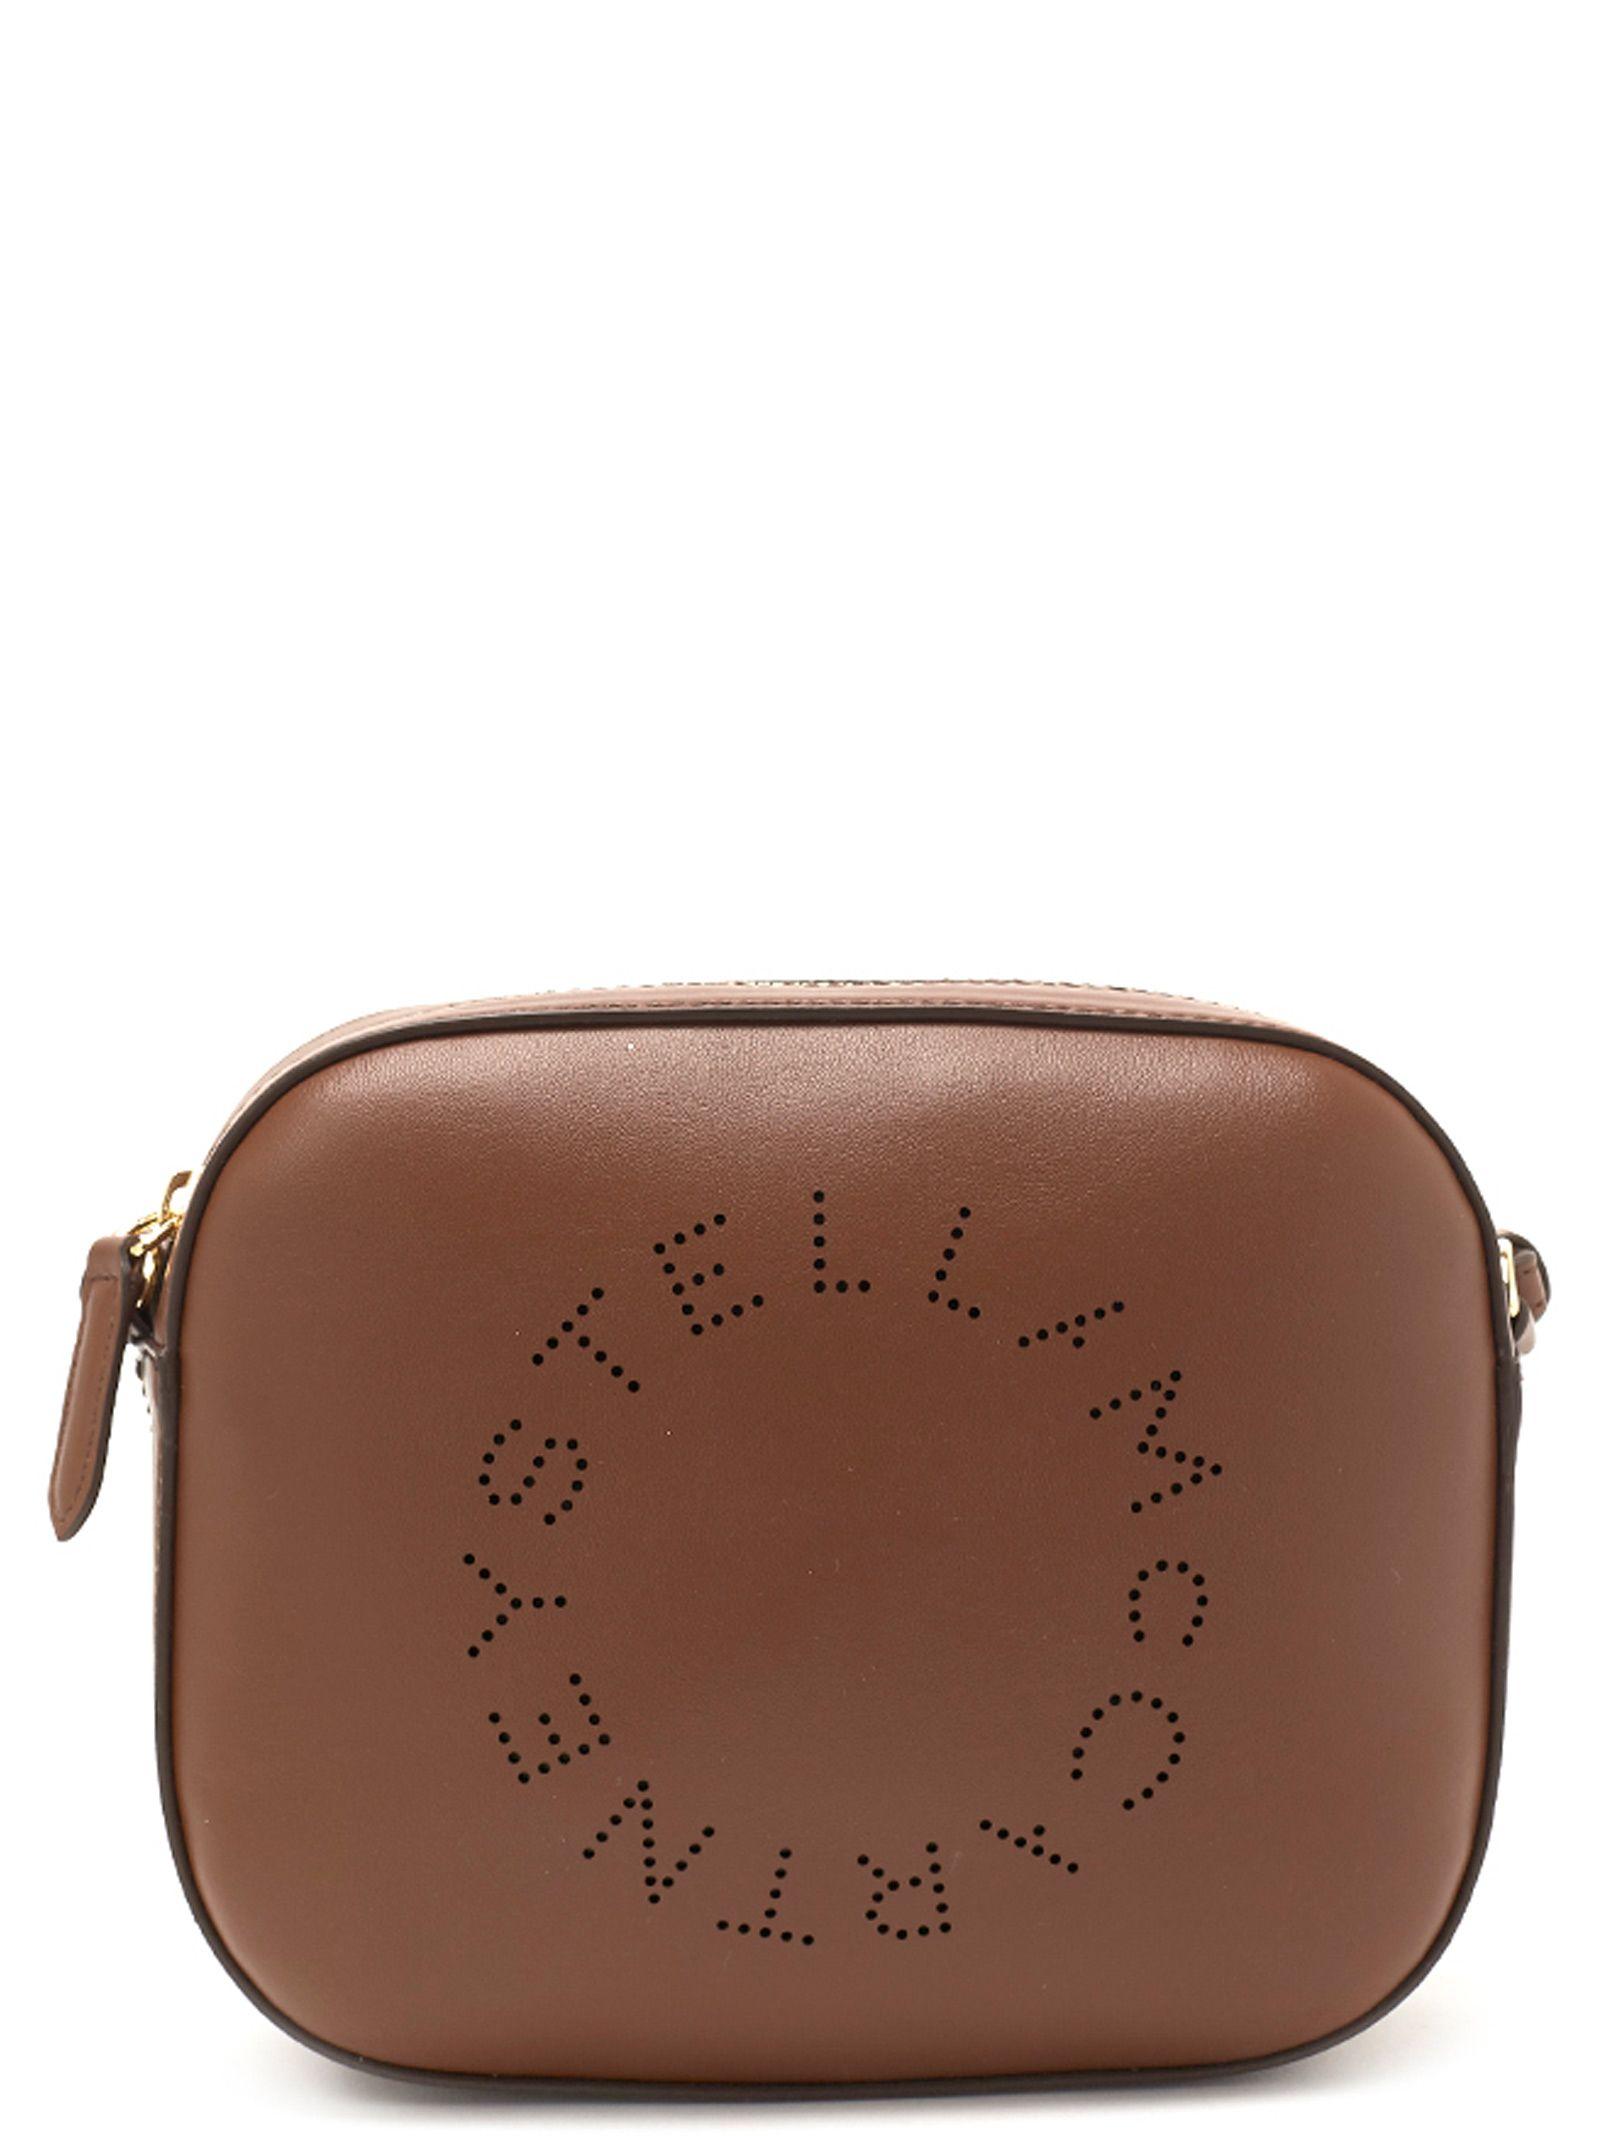 Stella McCartney Stella Mccartney  stella Logo  Bag - Brown ... f30203f21cbe9